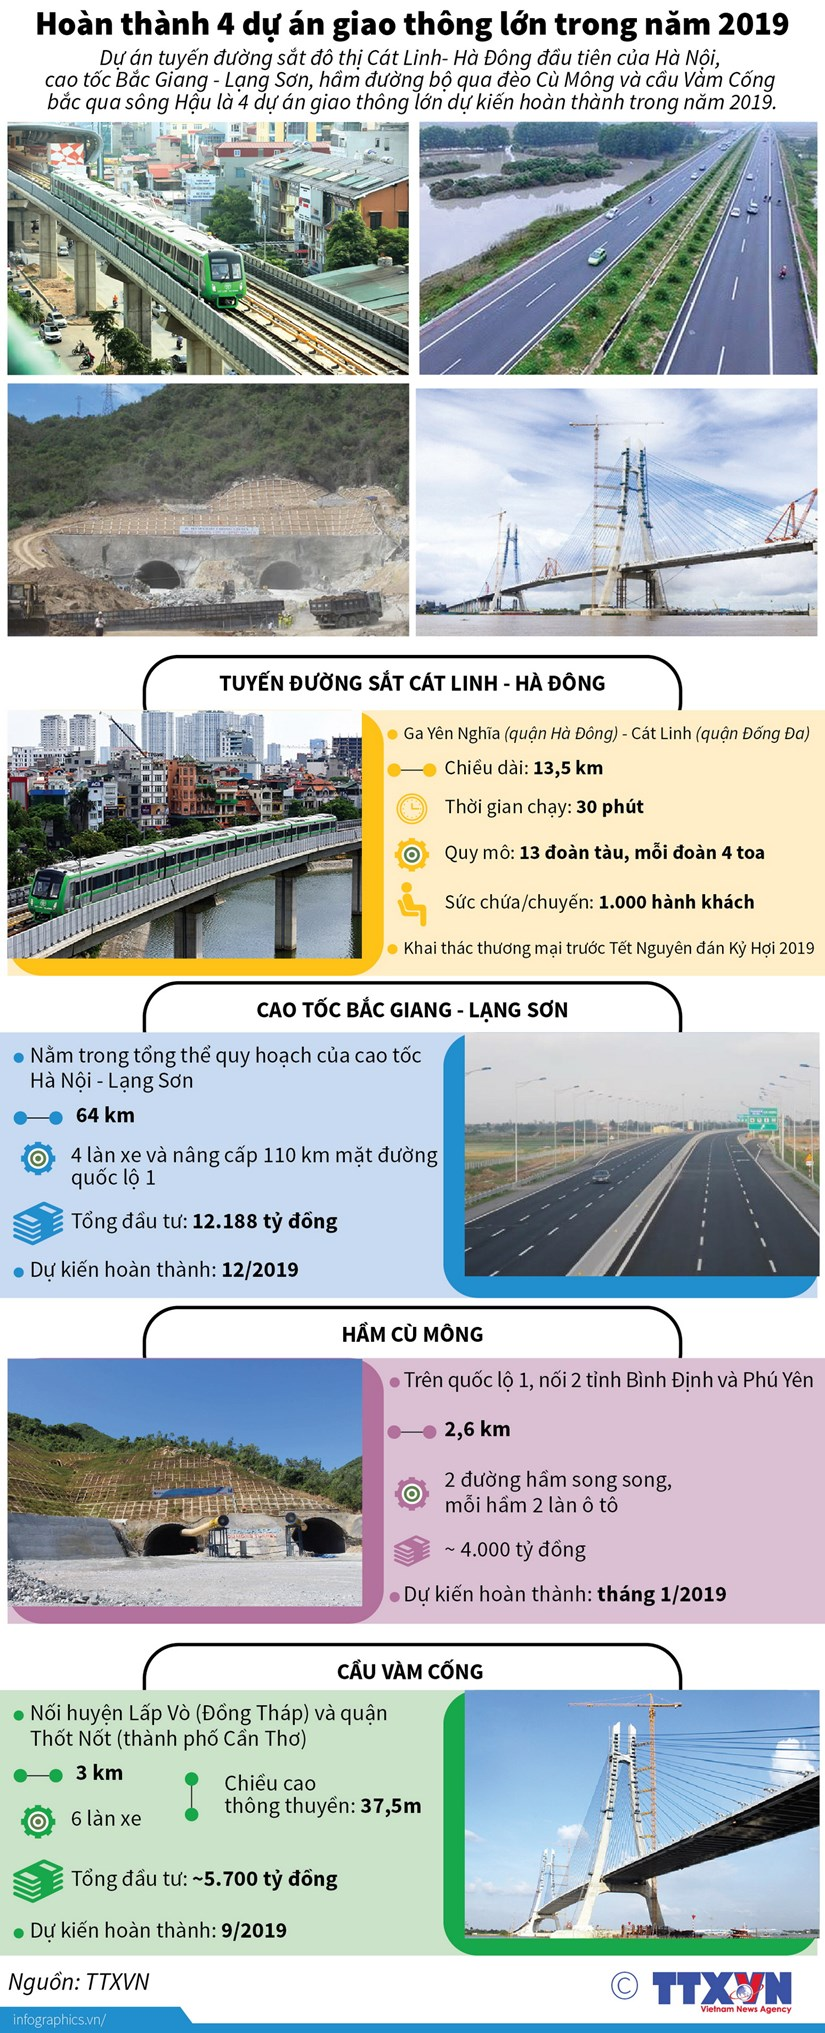 [Infographics] Hoan thanh 4 du an giao thong lon trong nam 2019 hinh anh 1